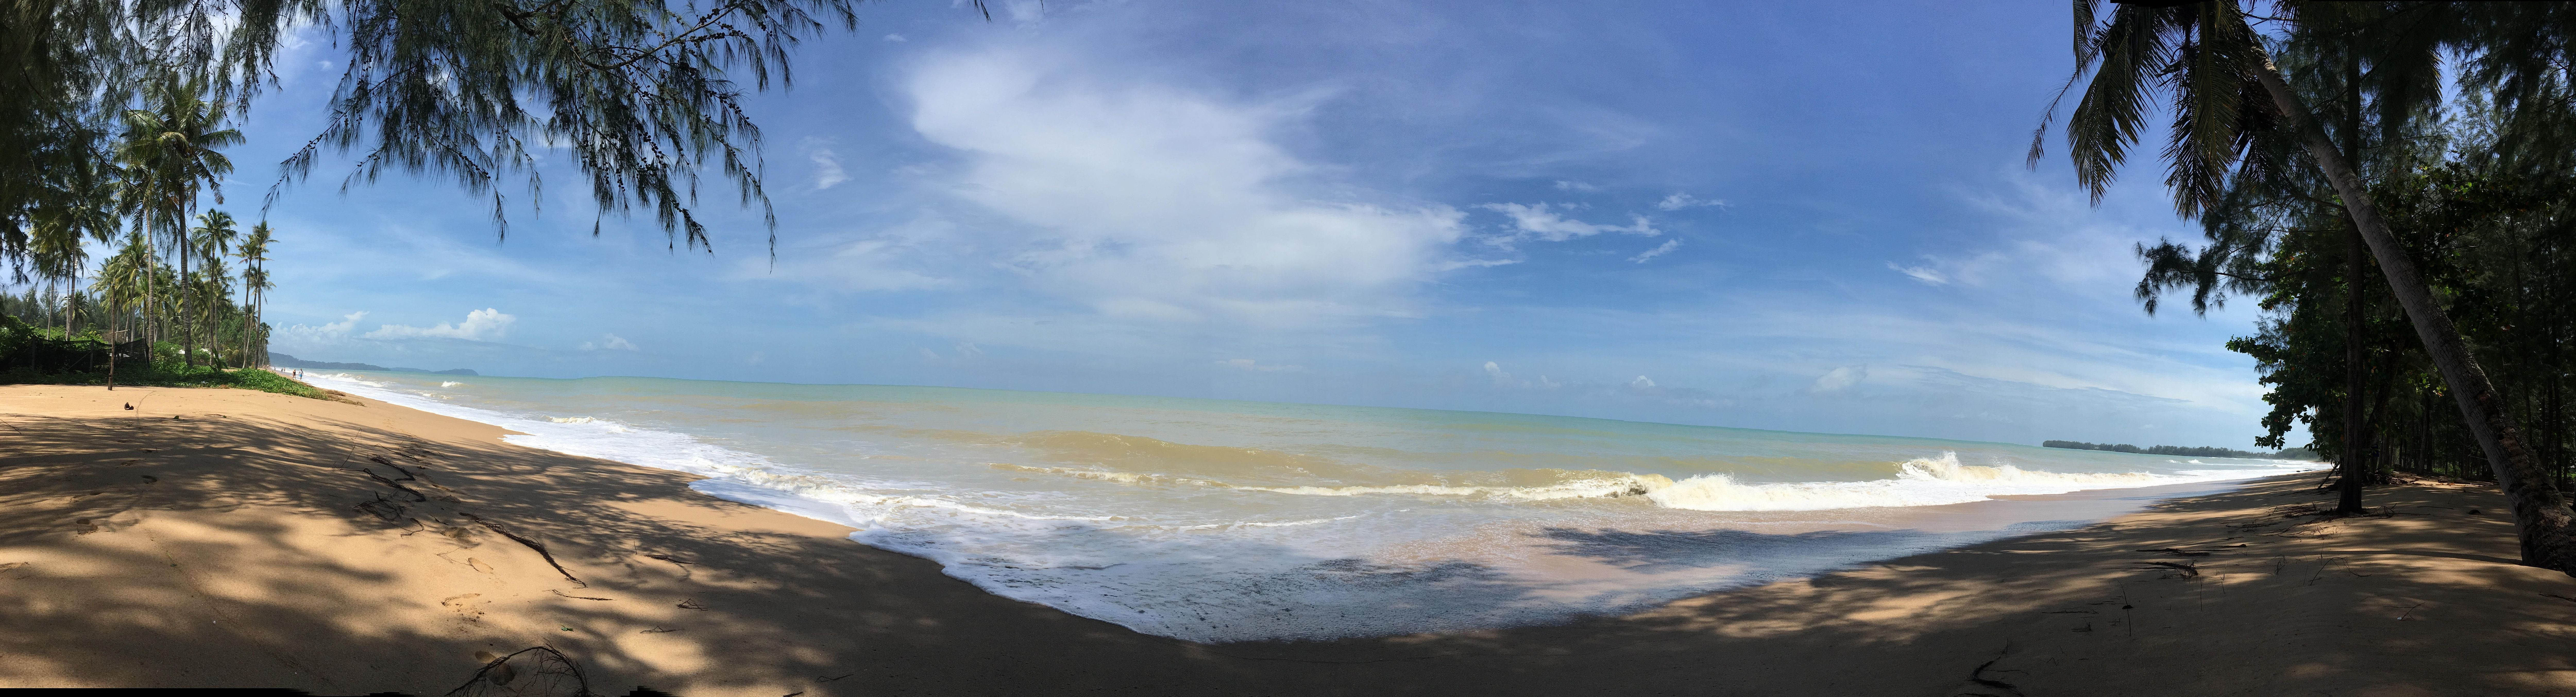 Khao Lak paradise beach